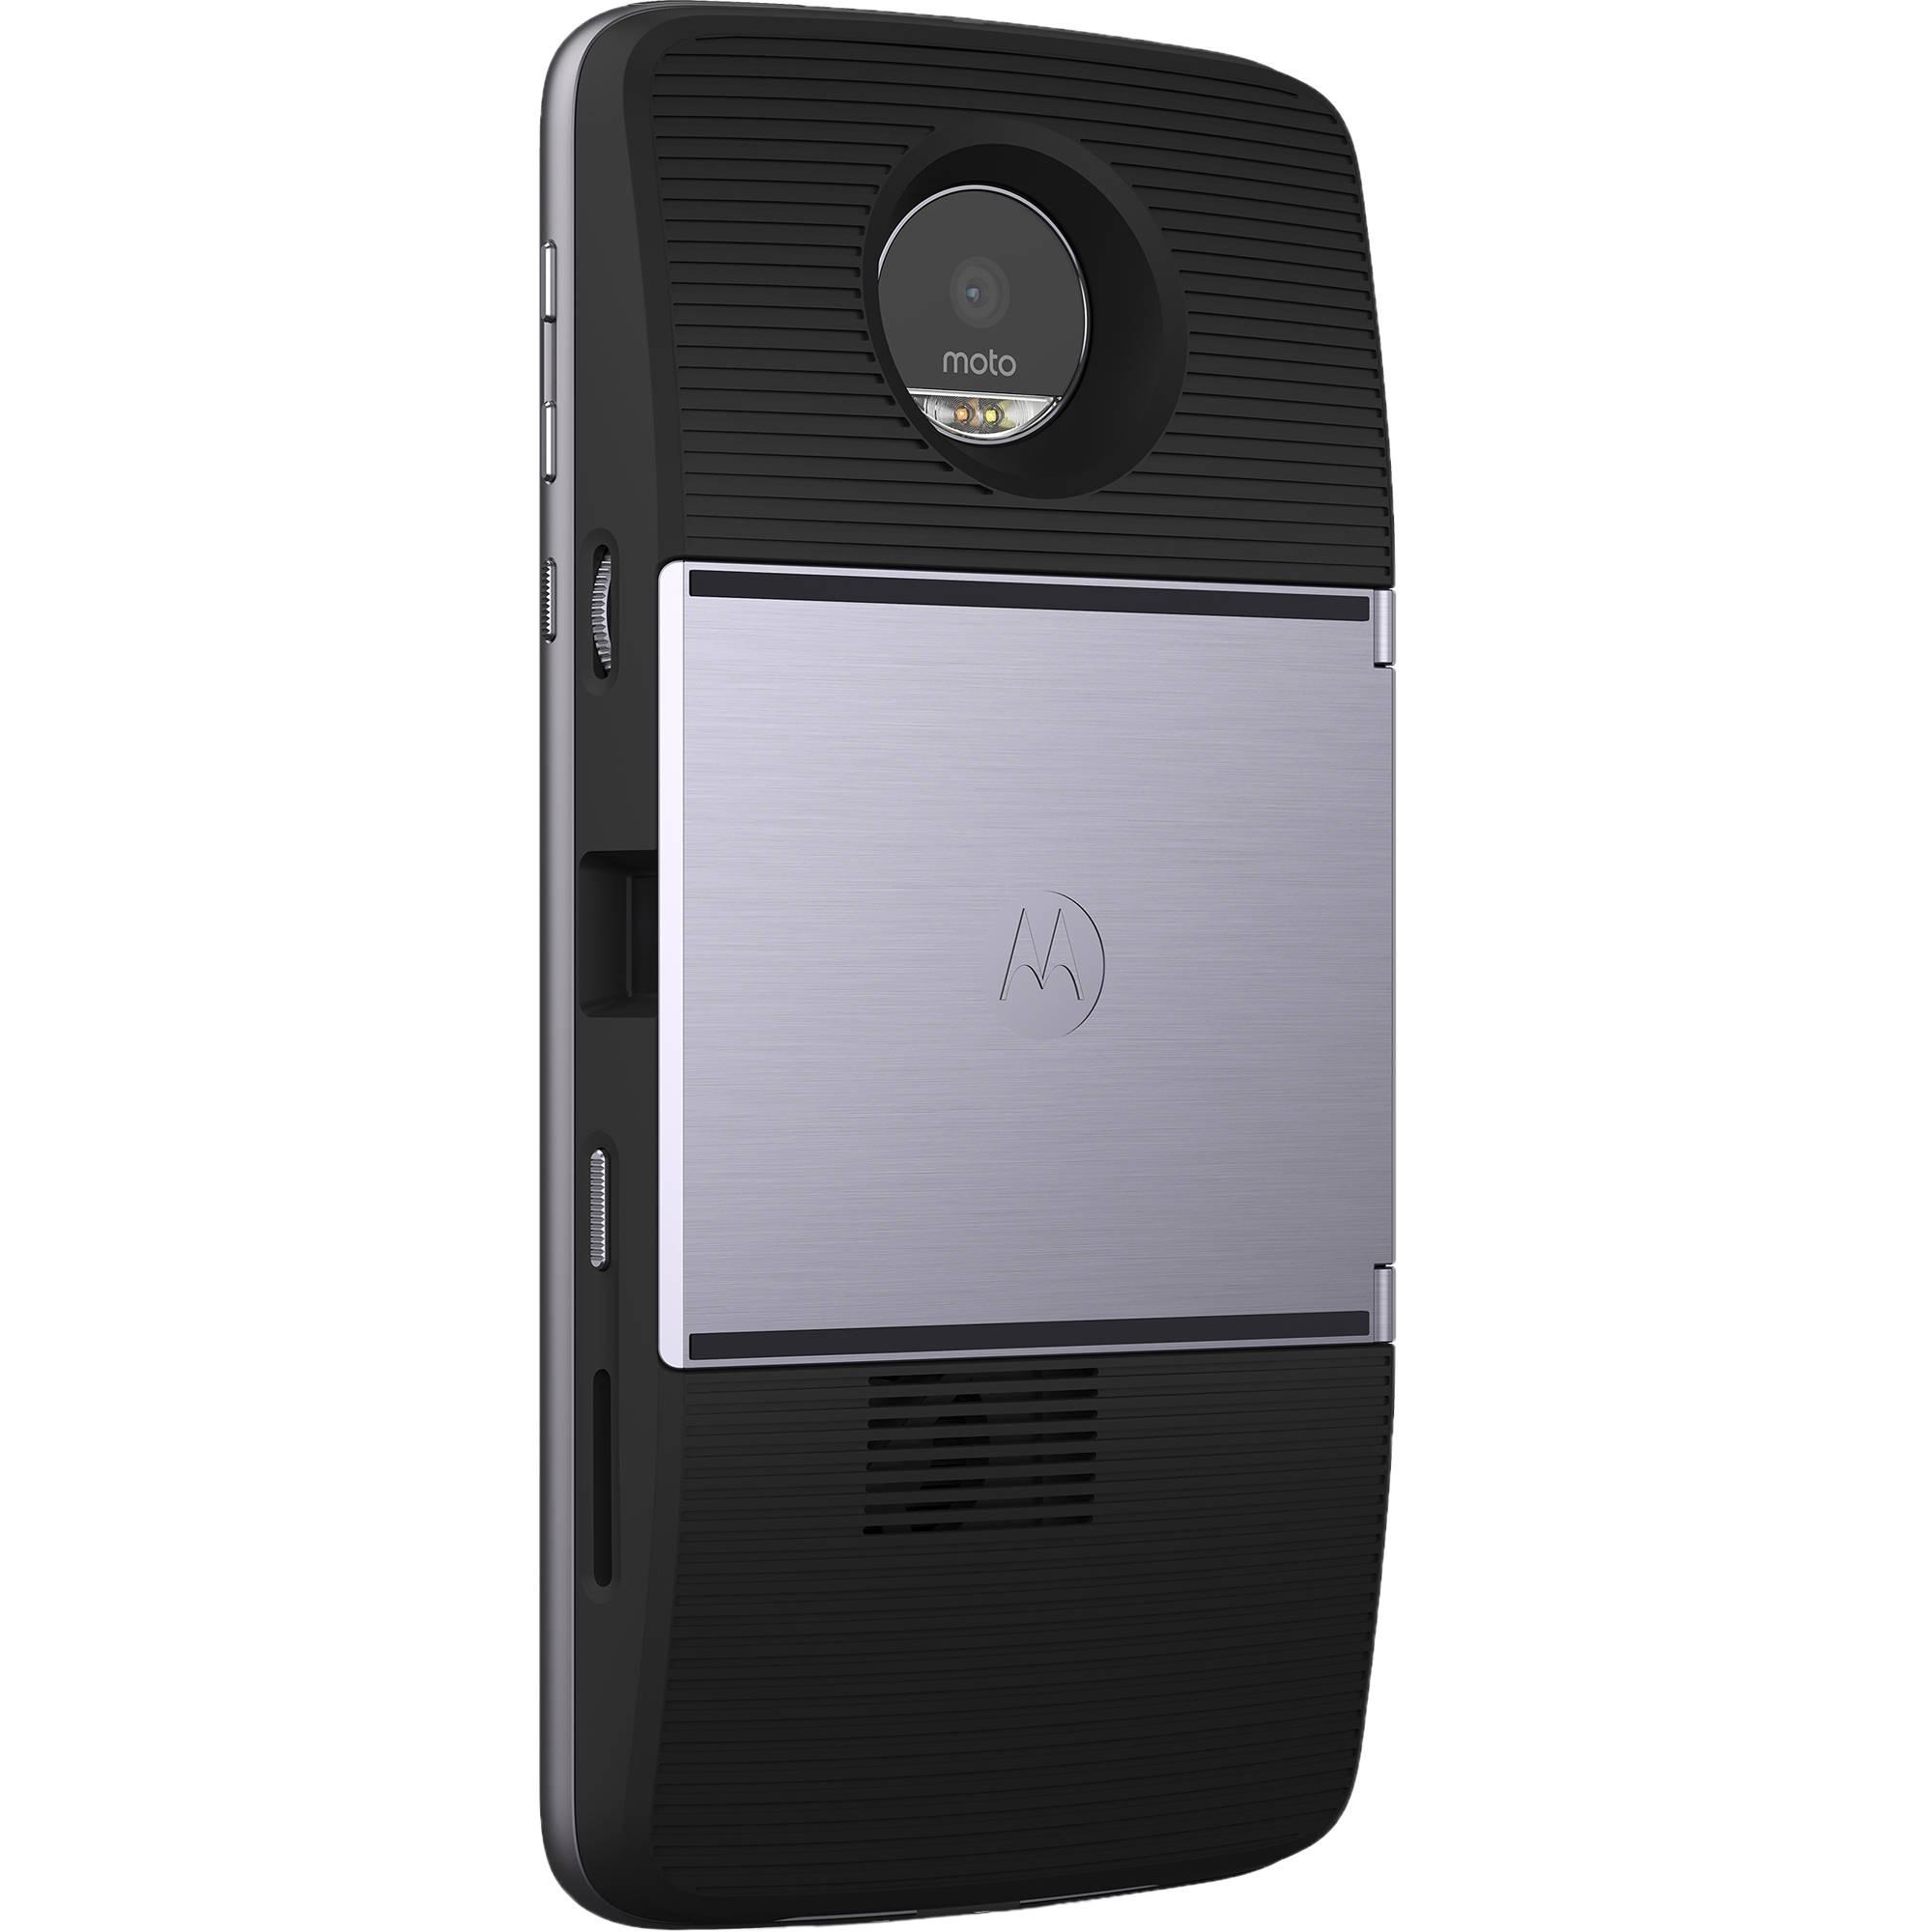 f8d99de46 Moto Insta-Share DLP Projector for Moto Z